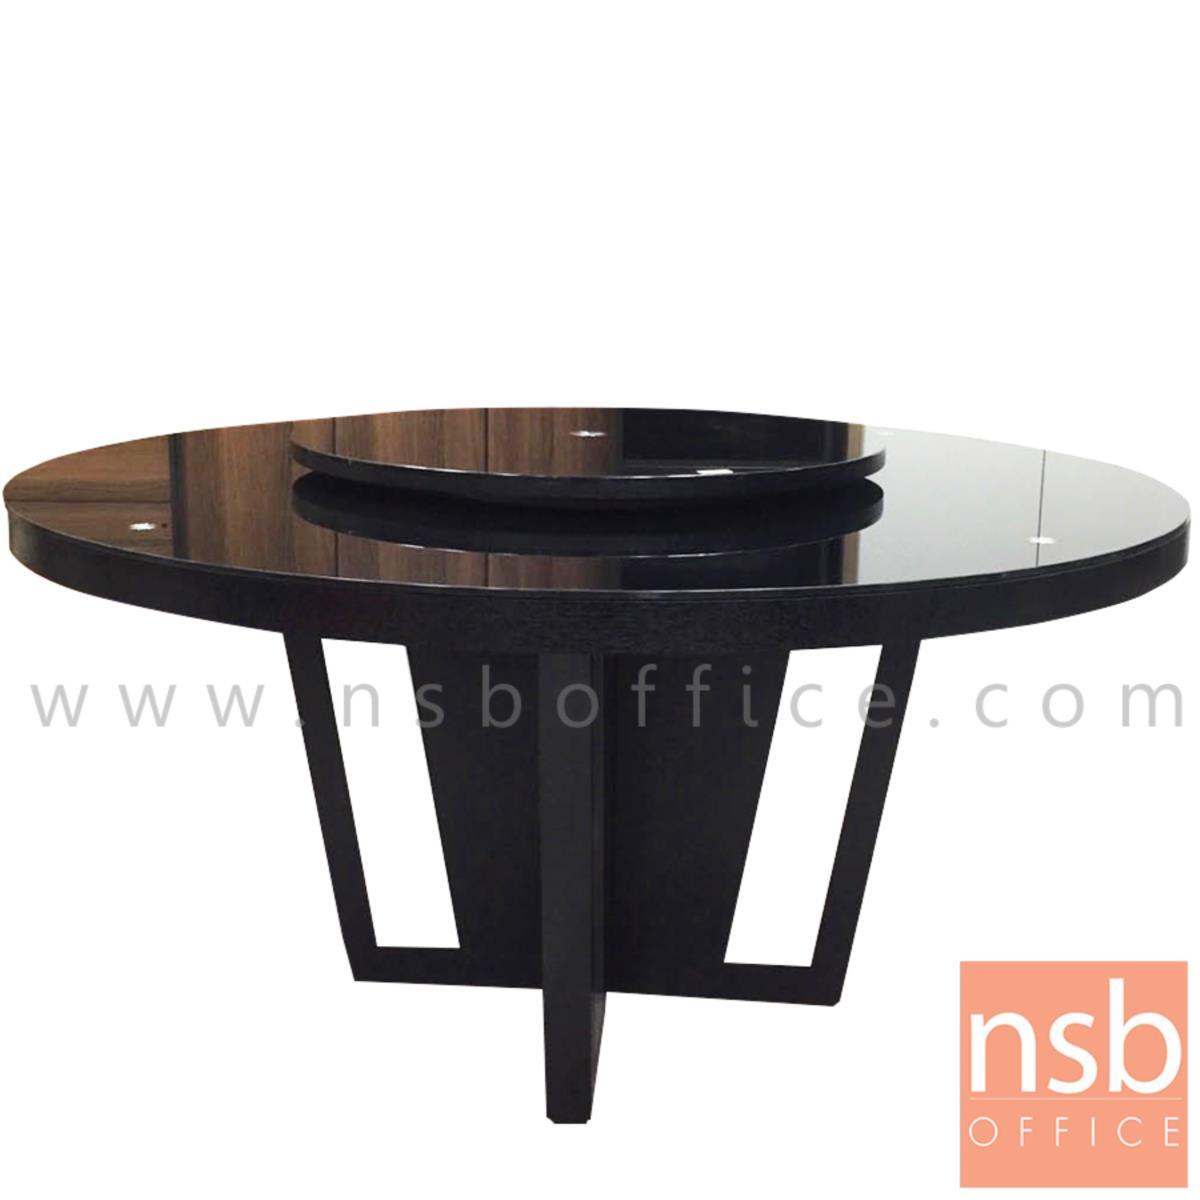 G14A173:โต๊ะรับประทานอาหารหน้ากระจกชาดำ รุ่น Applegate (แอปเปิลเกต) ขนาด 135Di ,150Di cm.